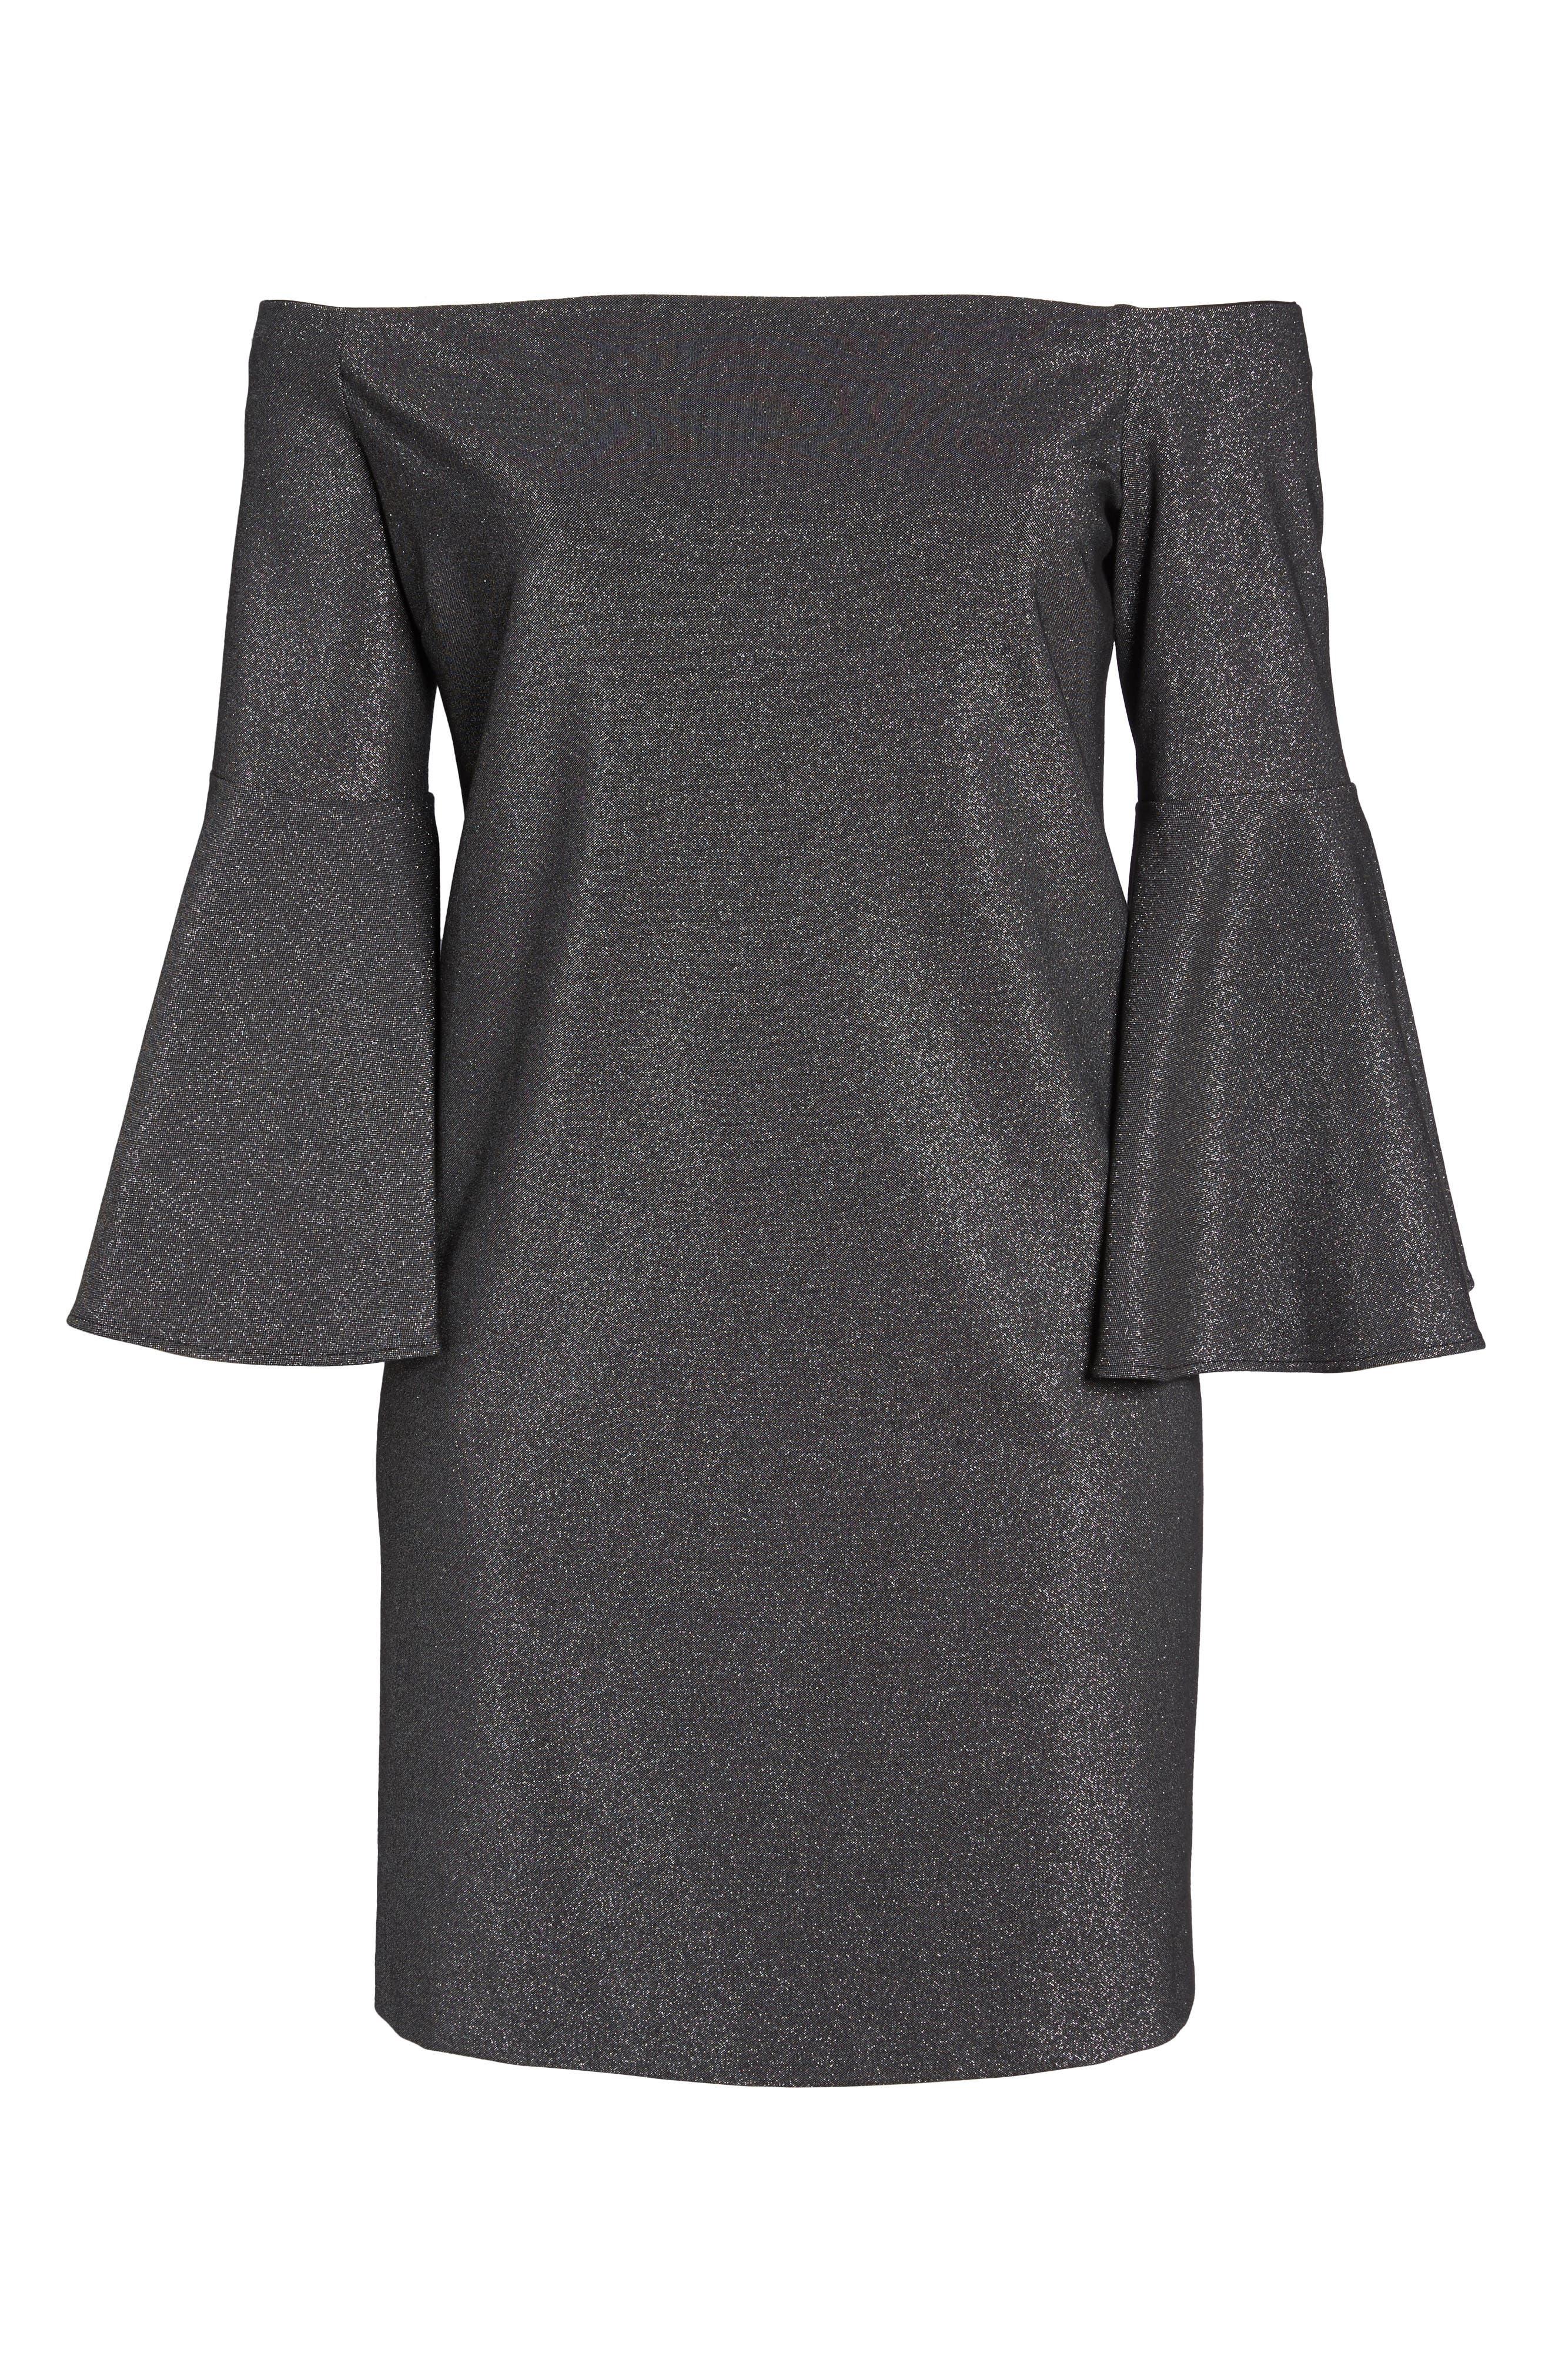 Off the Shoulder Metallic Sheath Dress,                             Alternate thumbnail 6, color,                             006